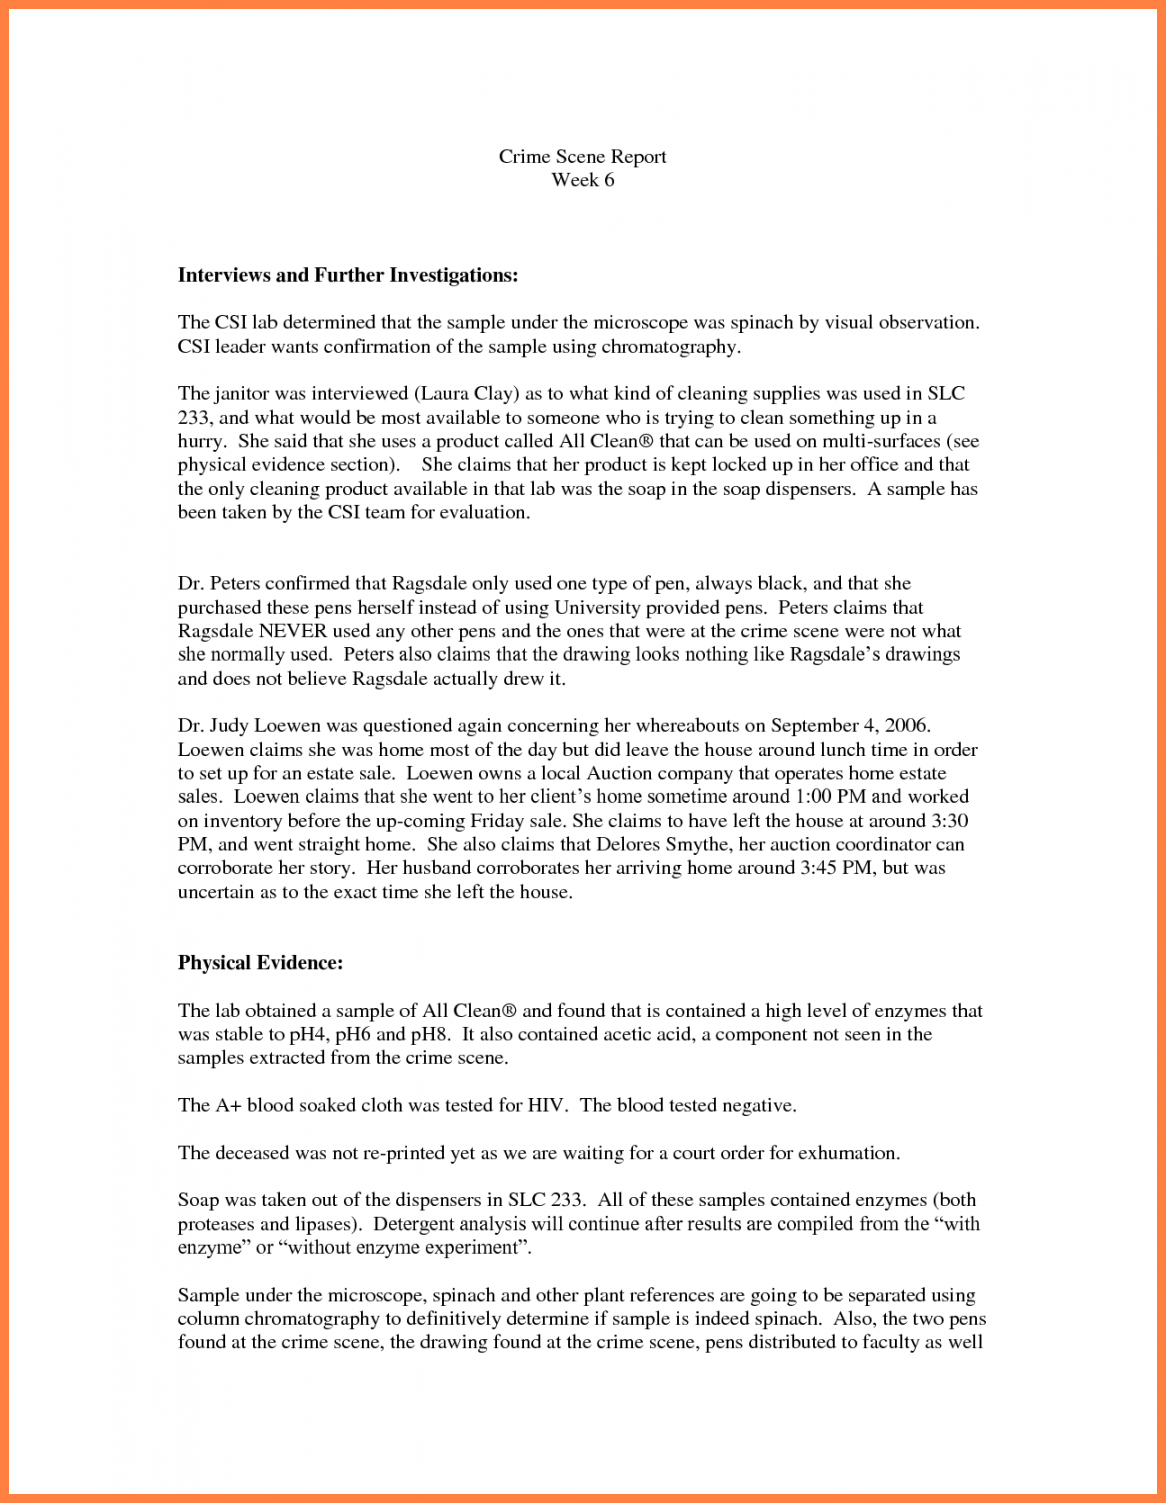 Criminal Investigation Report Template Inside Crime Scene Report Template